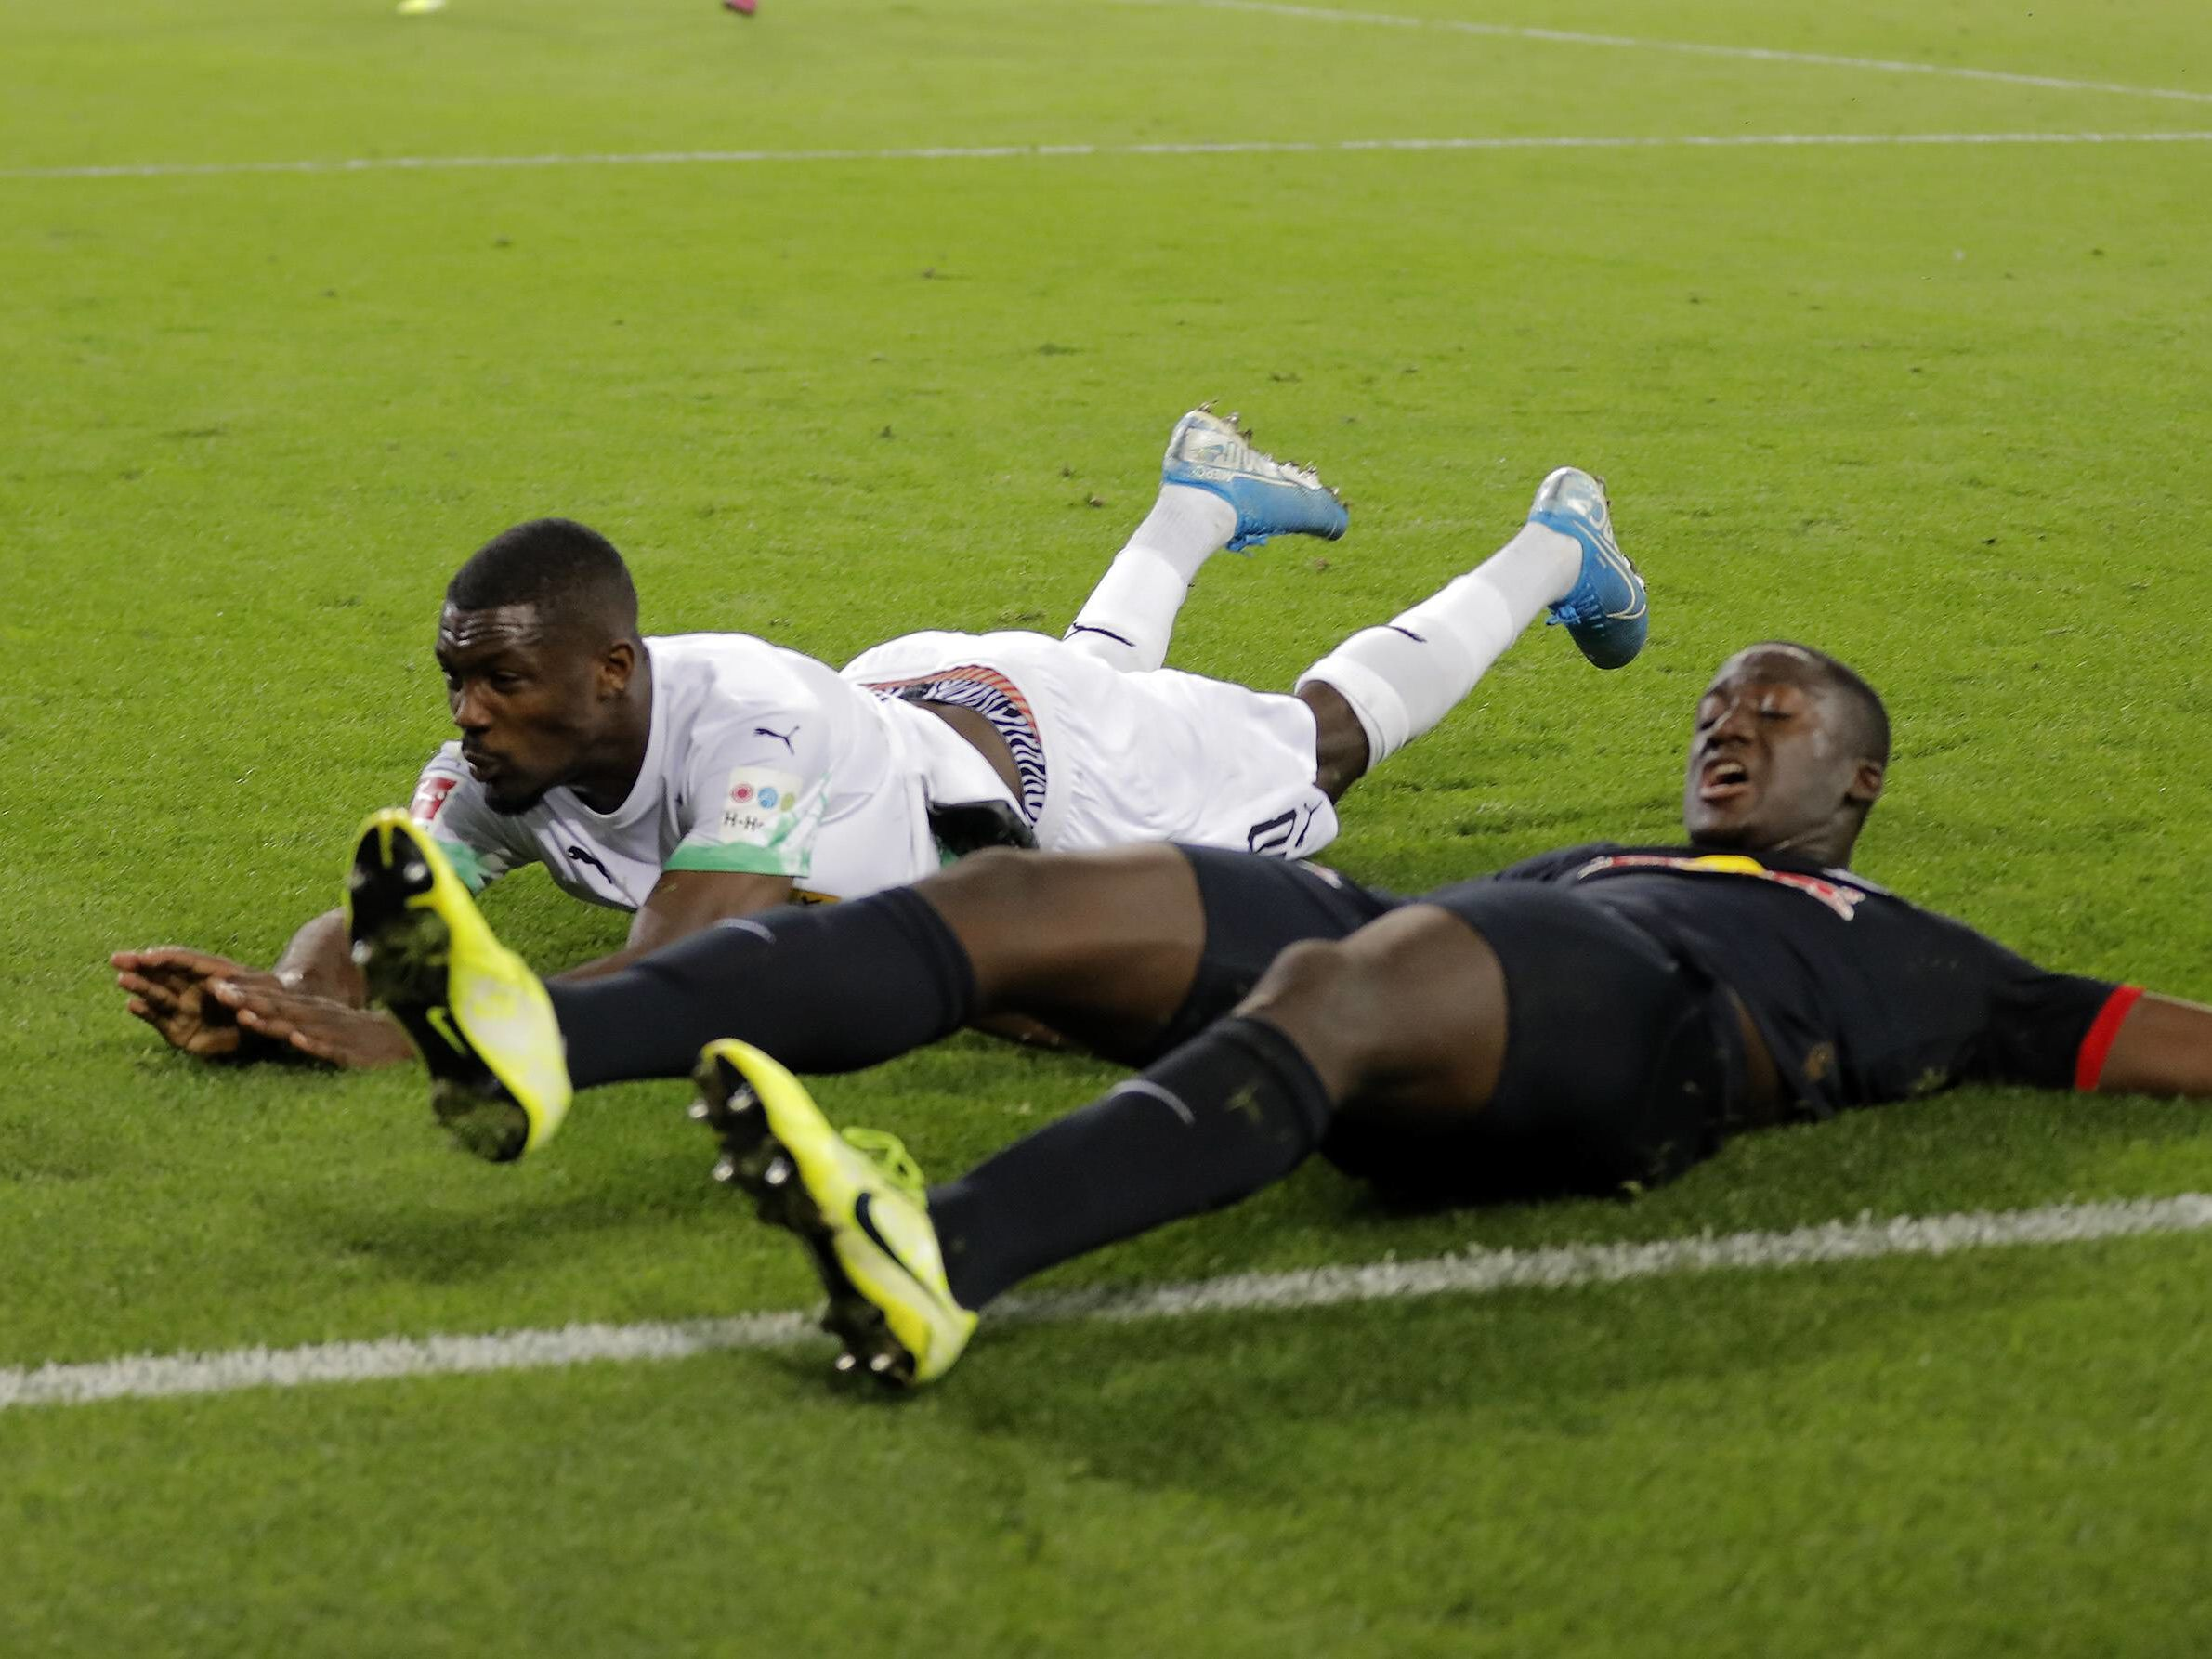 Viele Zweikämpfe: Marcus Thuram (li.) und Ibrahima Konaté kommen jeweils nicht an den Ball heran.